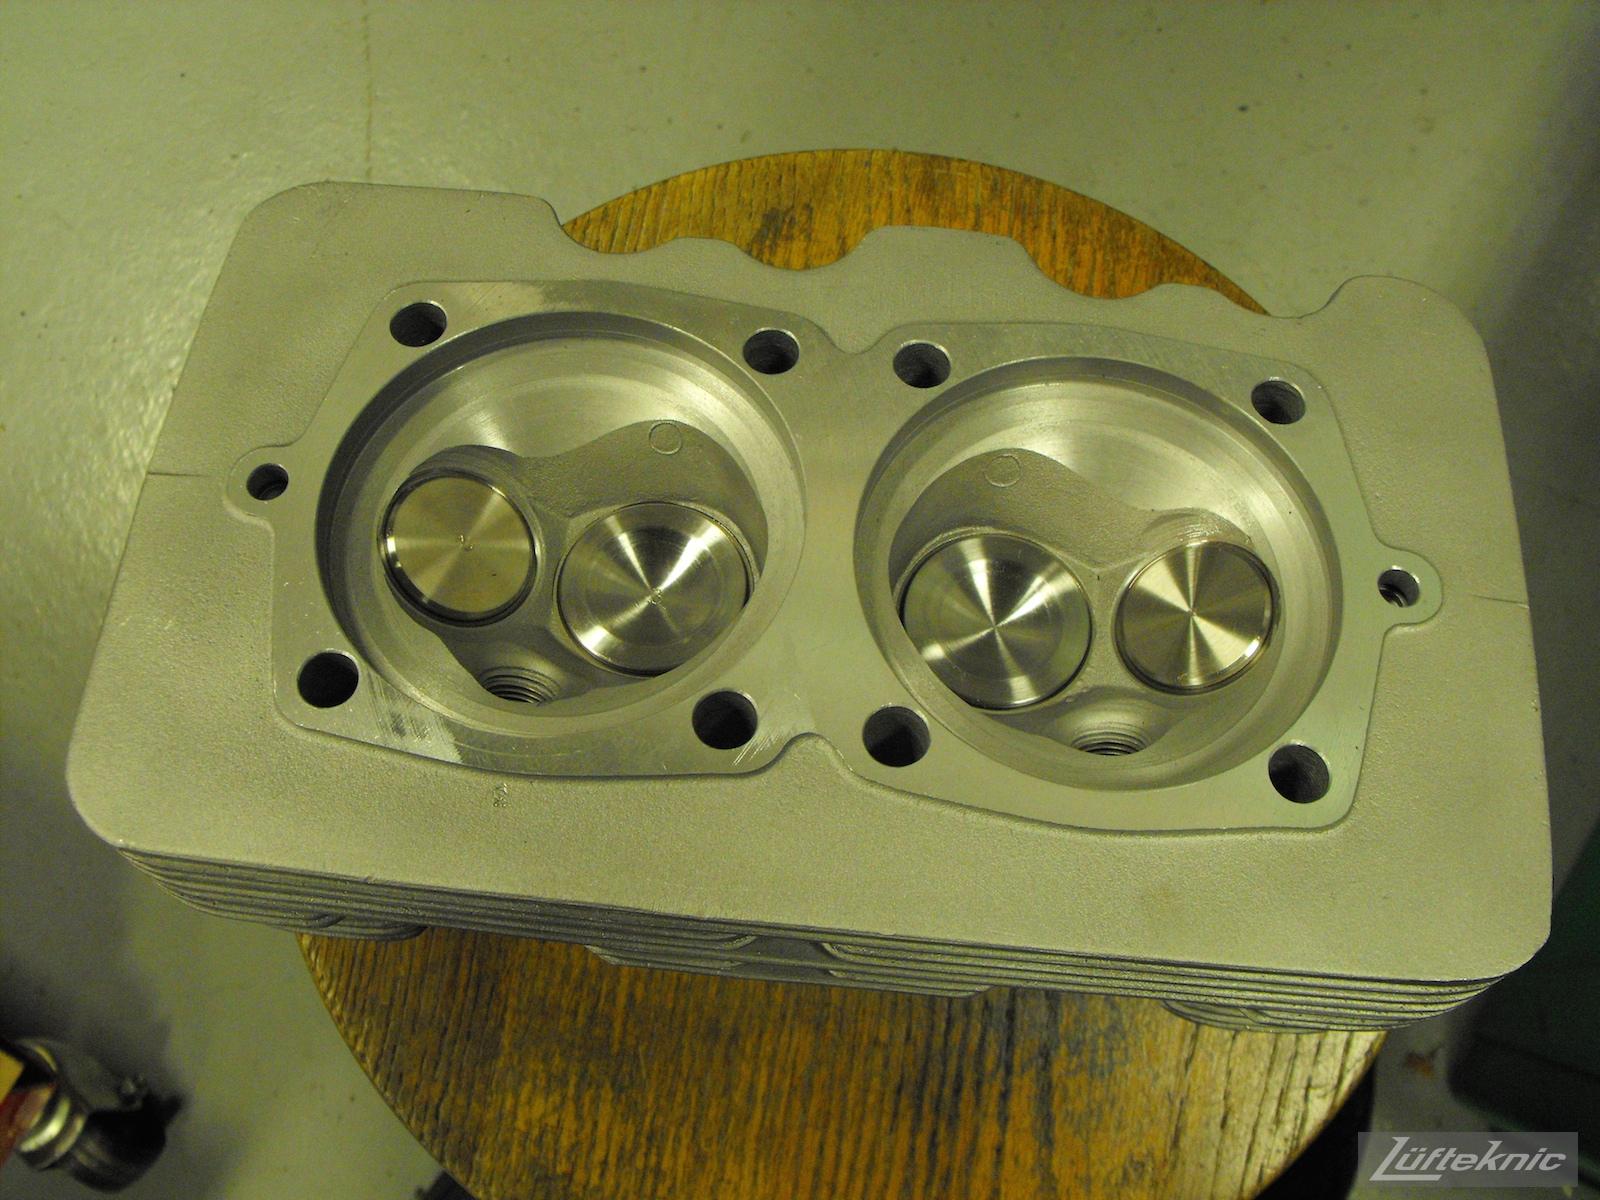 Refinished head showing valves for a 1961 Porsche 356B Roadster restoration.